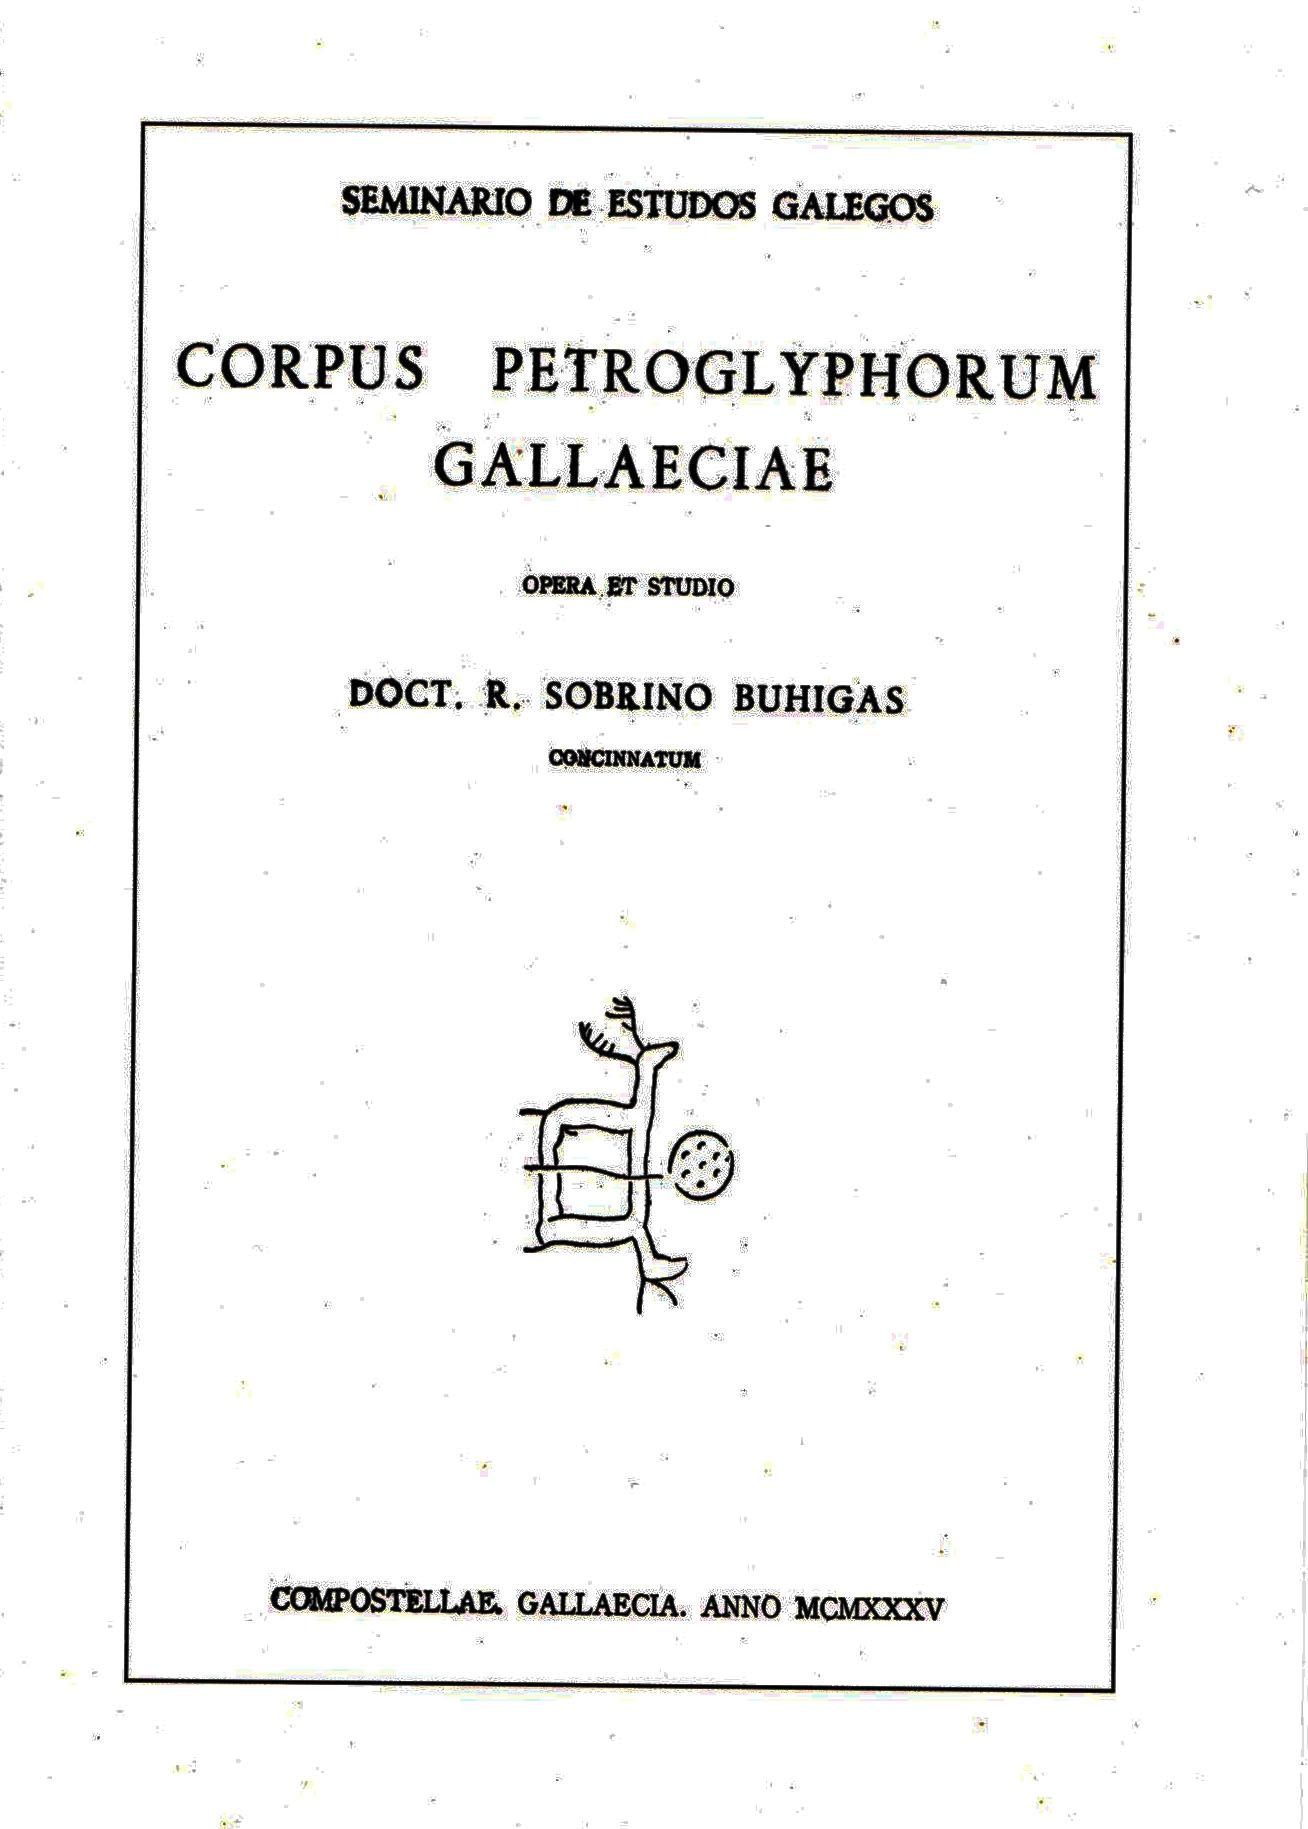 Corpus Petroglyphorum 1935.